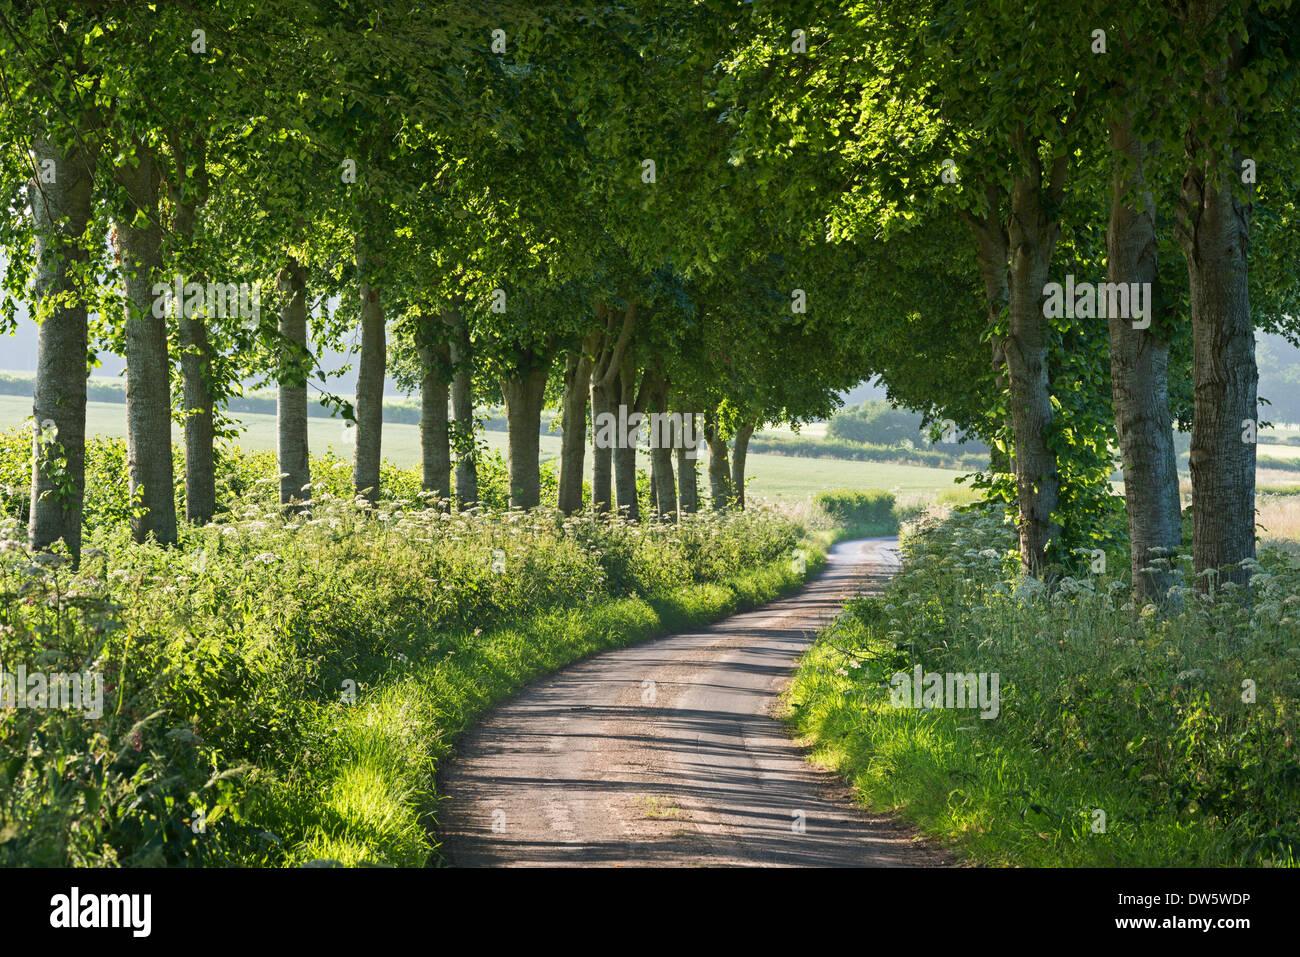 Wicklung Baum gesäumten Feldweg, Dorset, England. (Juli) im Sommer 2013. Stockbild